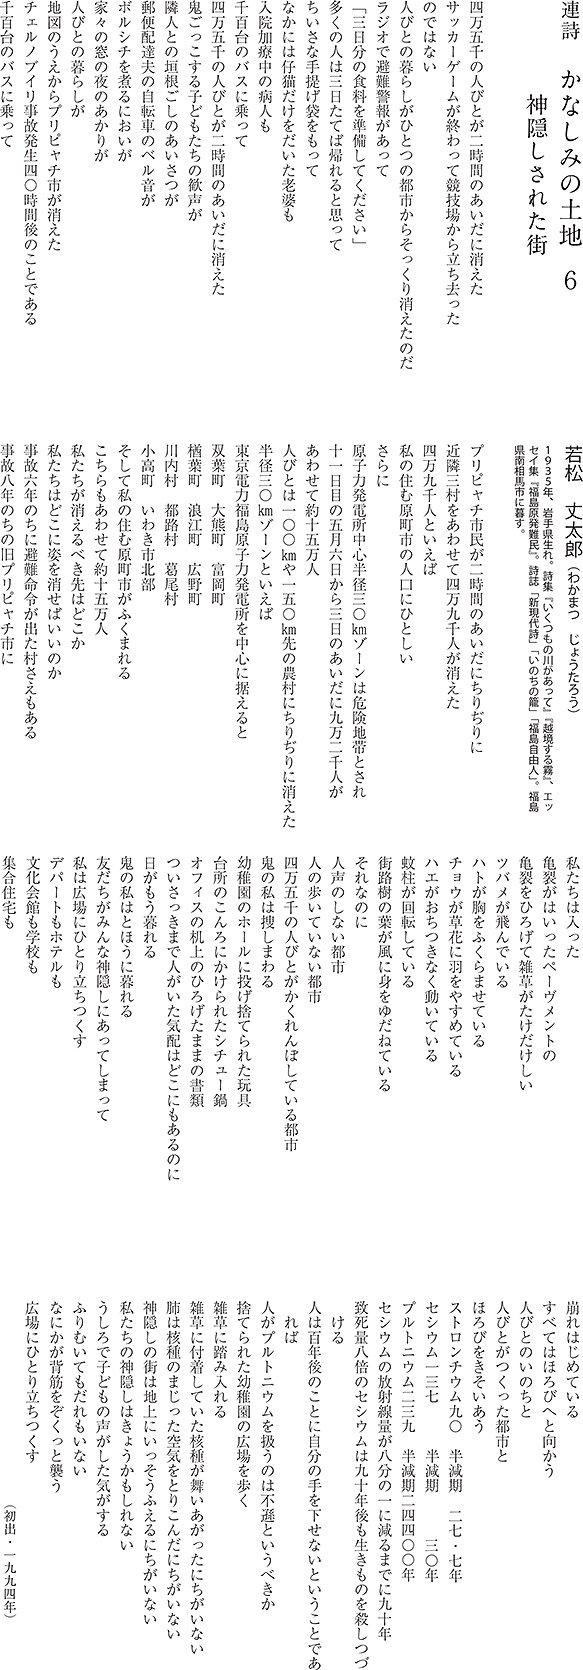 aLandOfSorrow_japanese